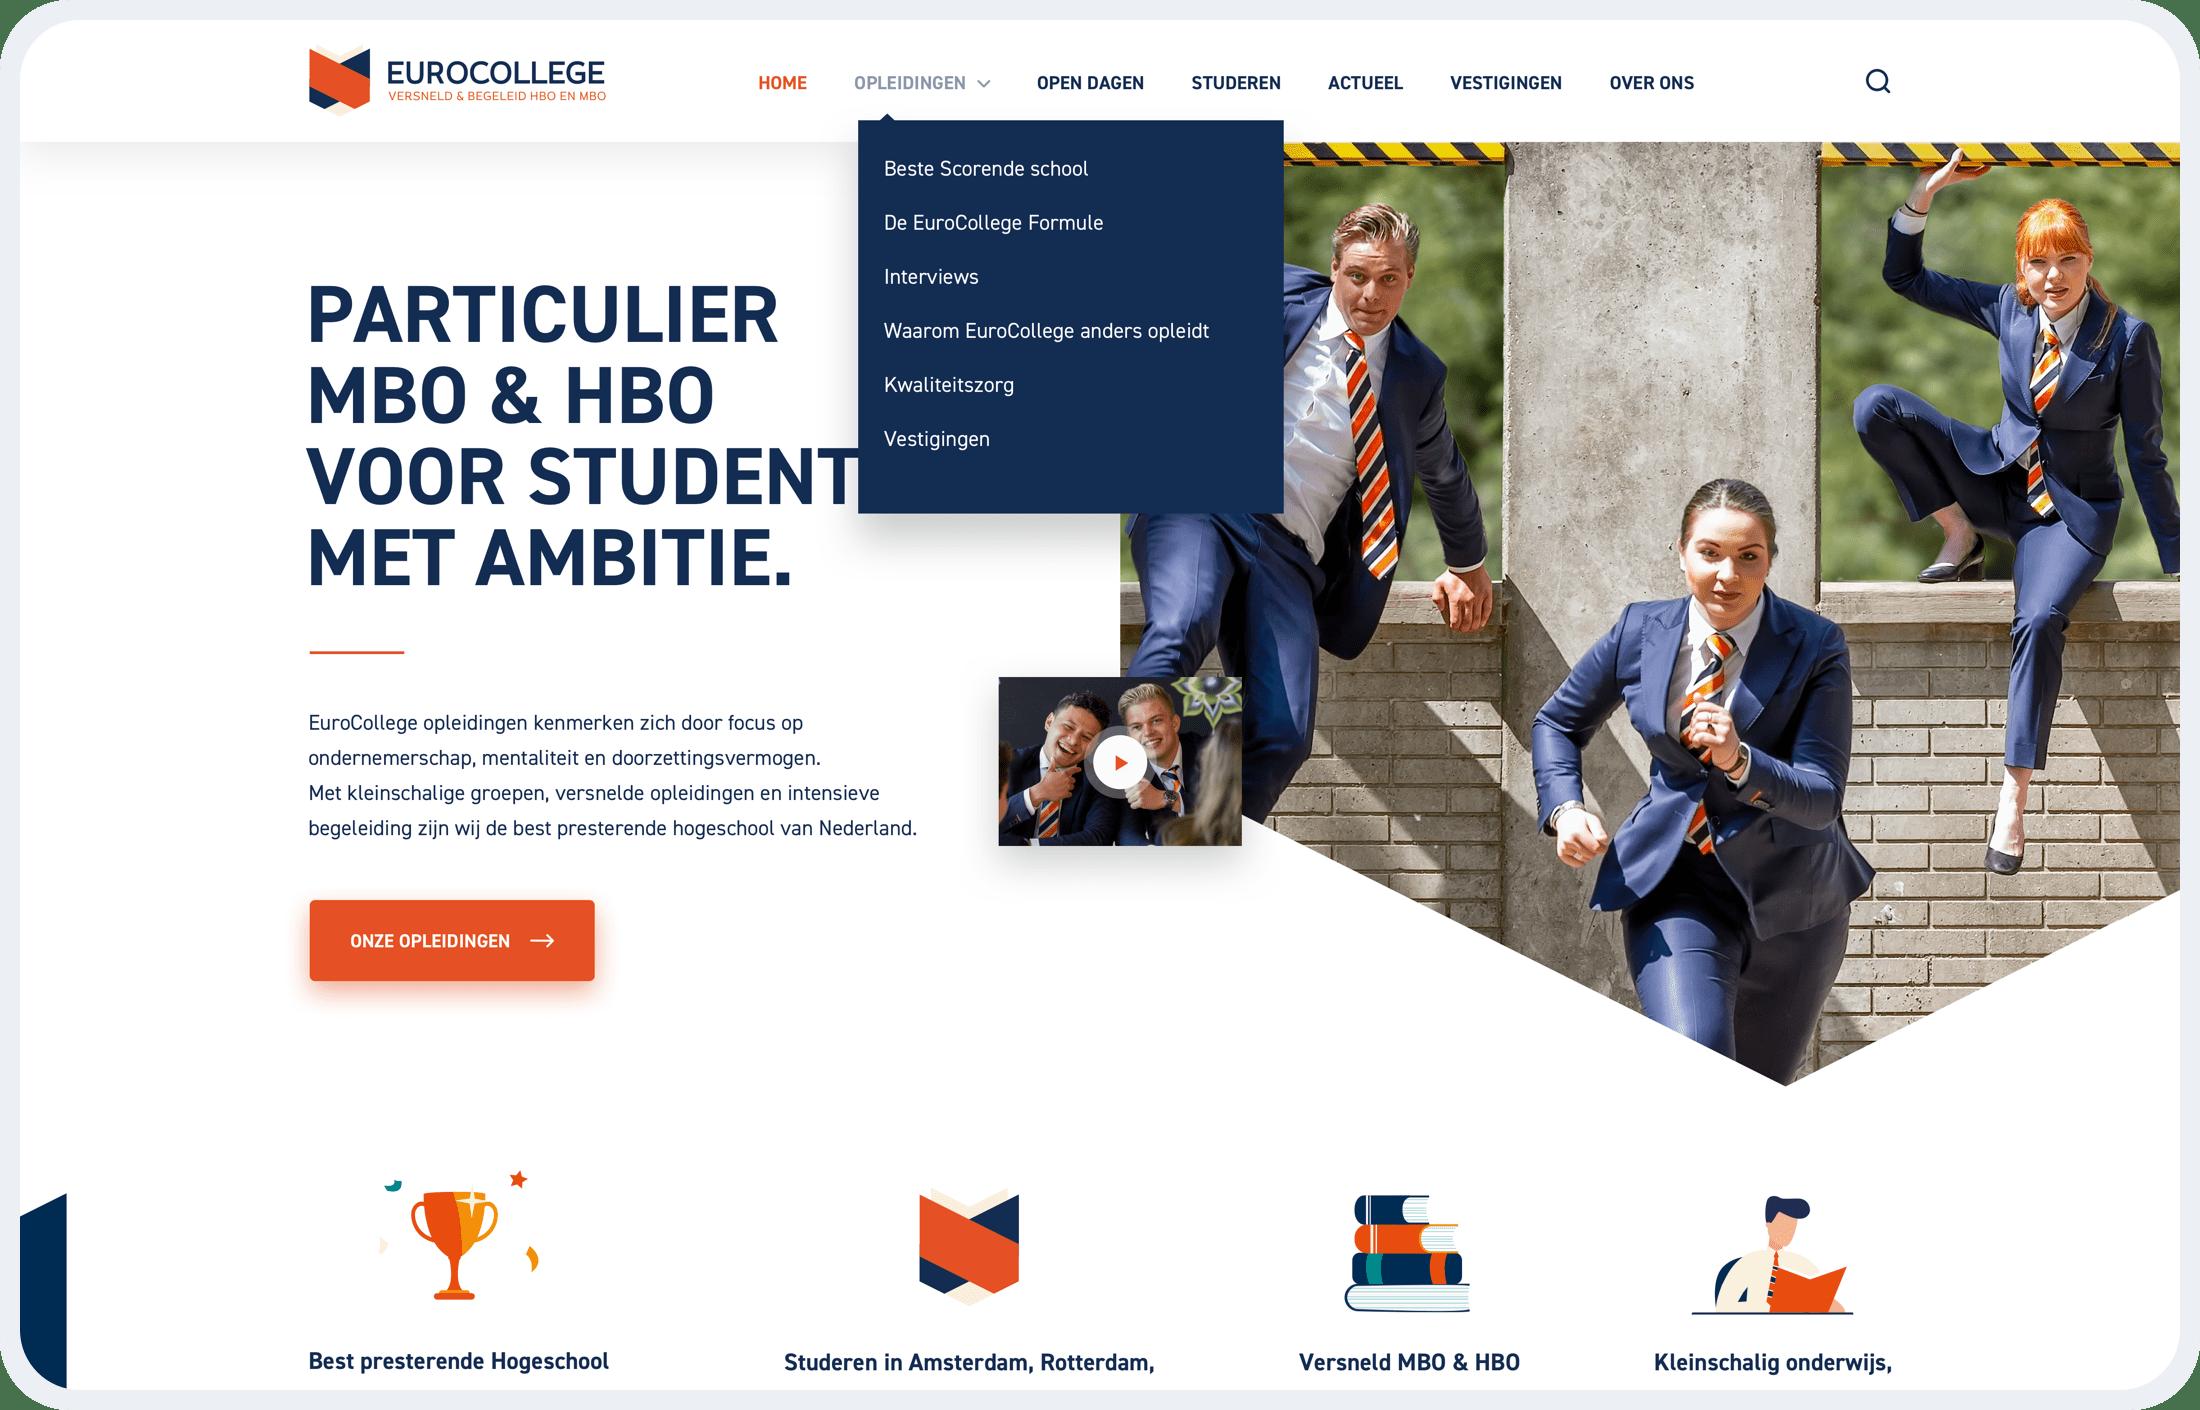 EuroCollege homepage